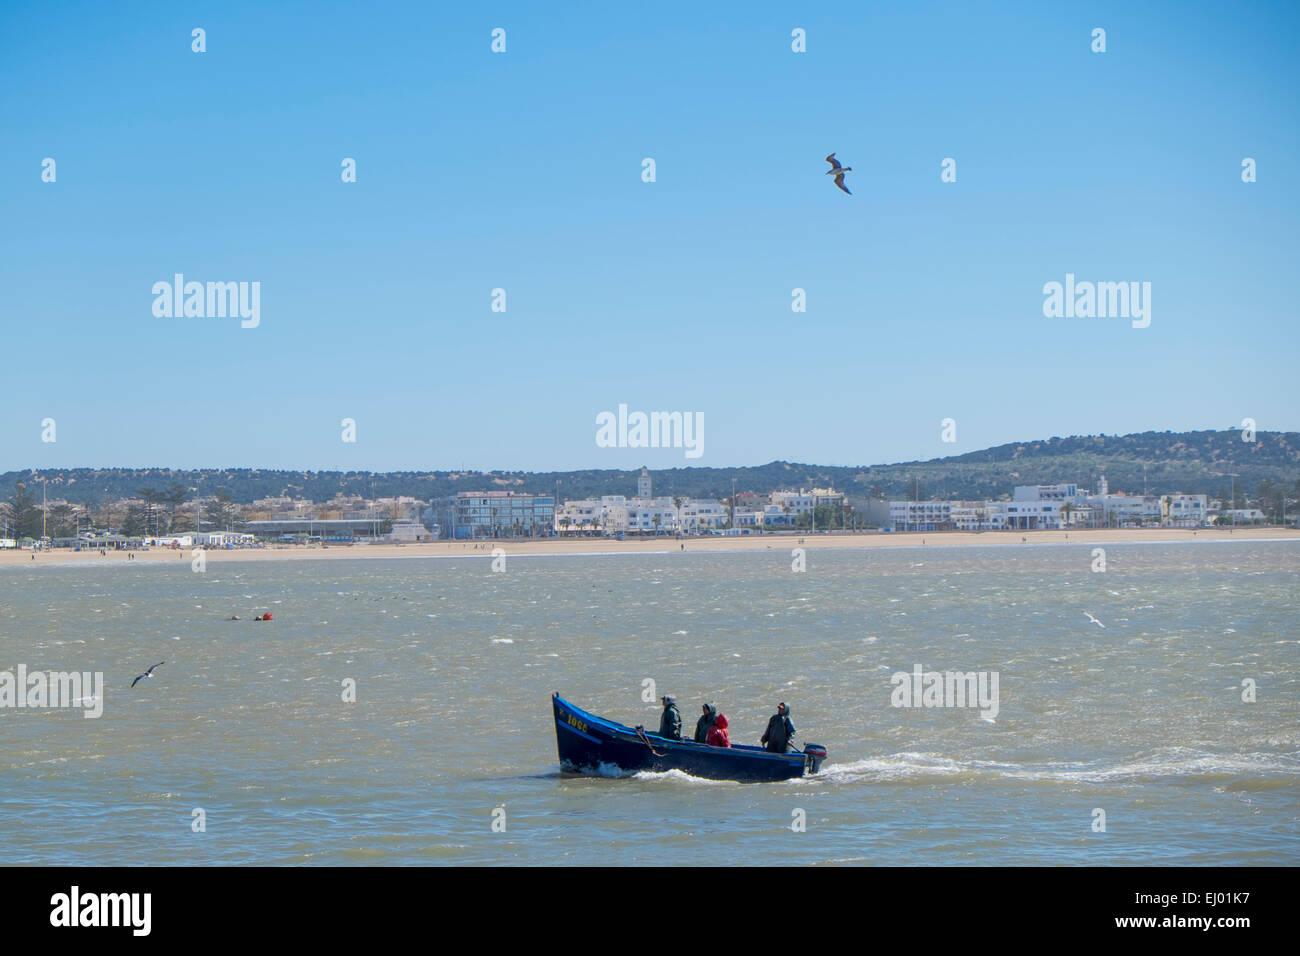 Barco pesquero llegando al puerto de Essaouira, Marruecos, Norte de África Imagen De Stock